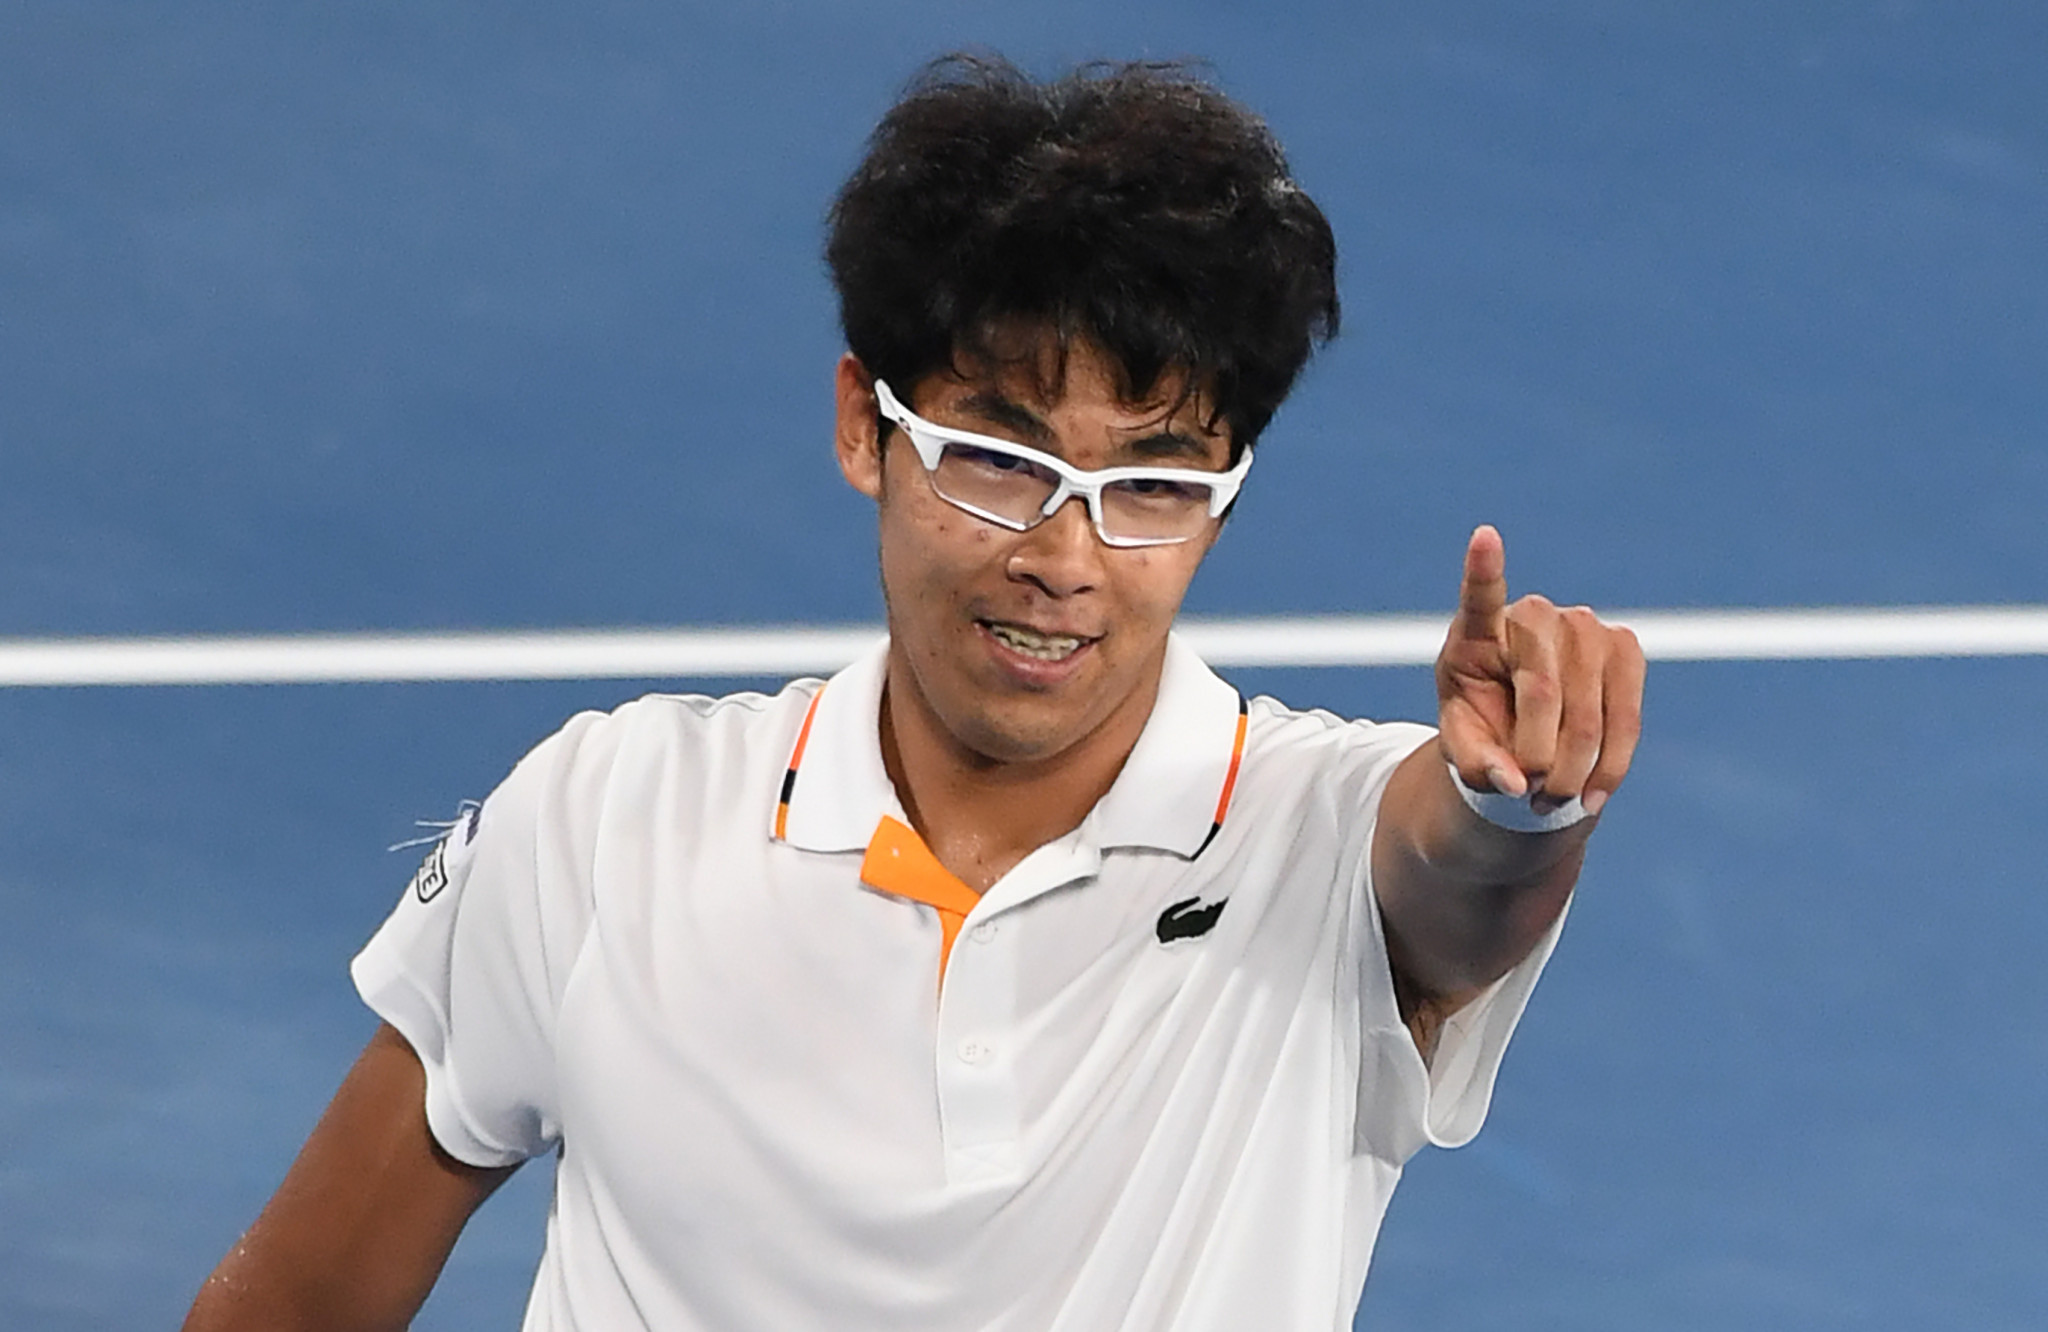 Six-time champion Djokovic suffers defeat to impressive Chung at Australian Open